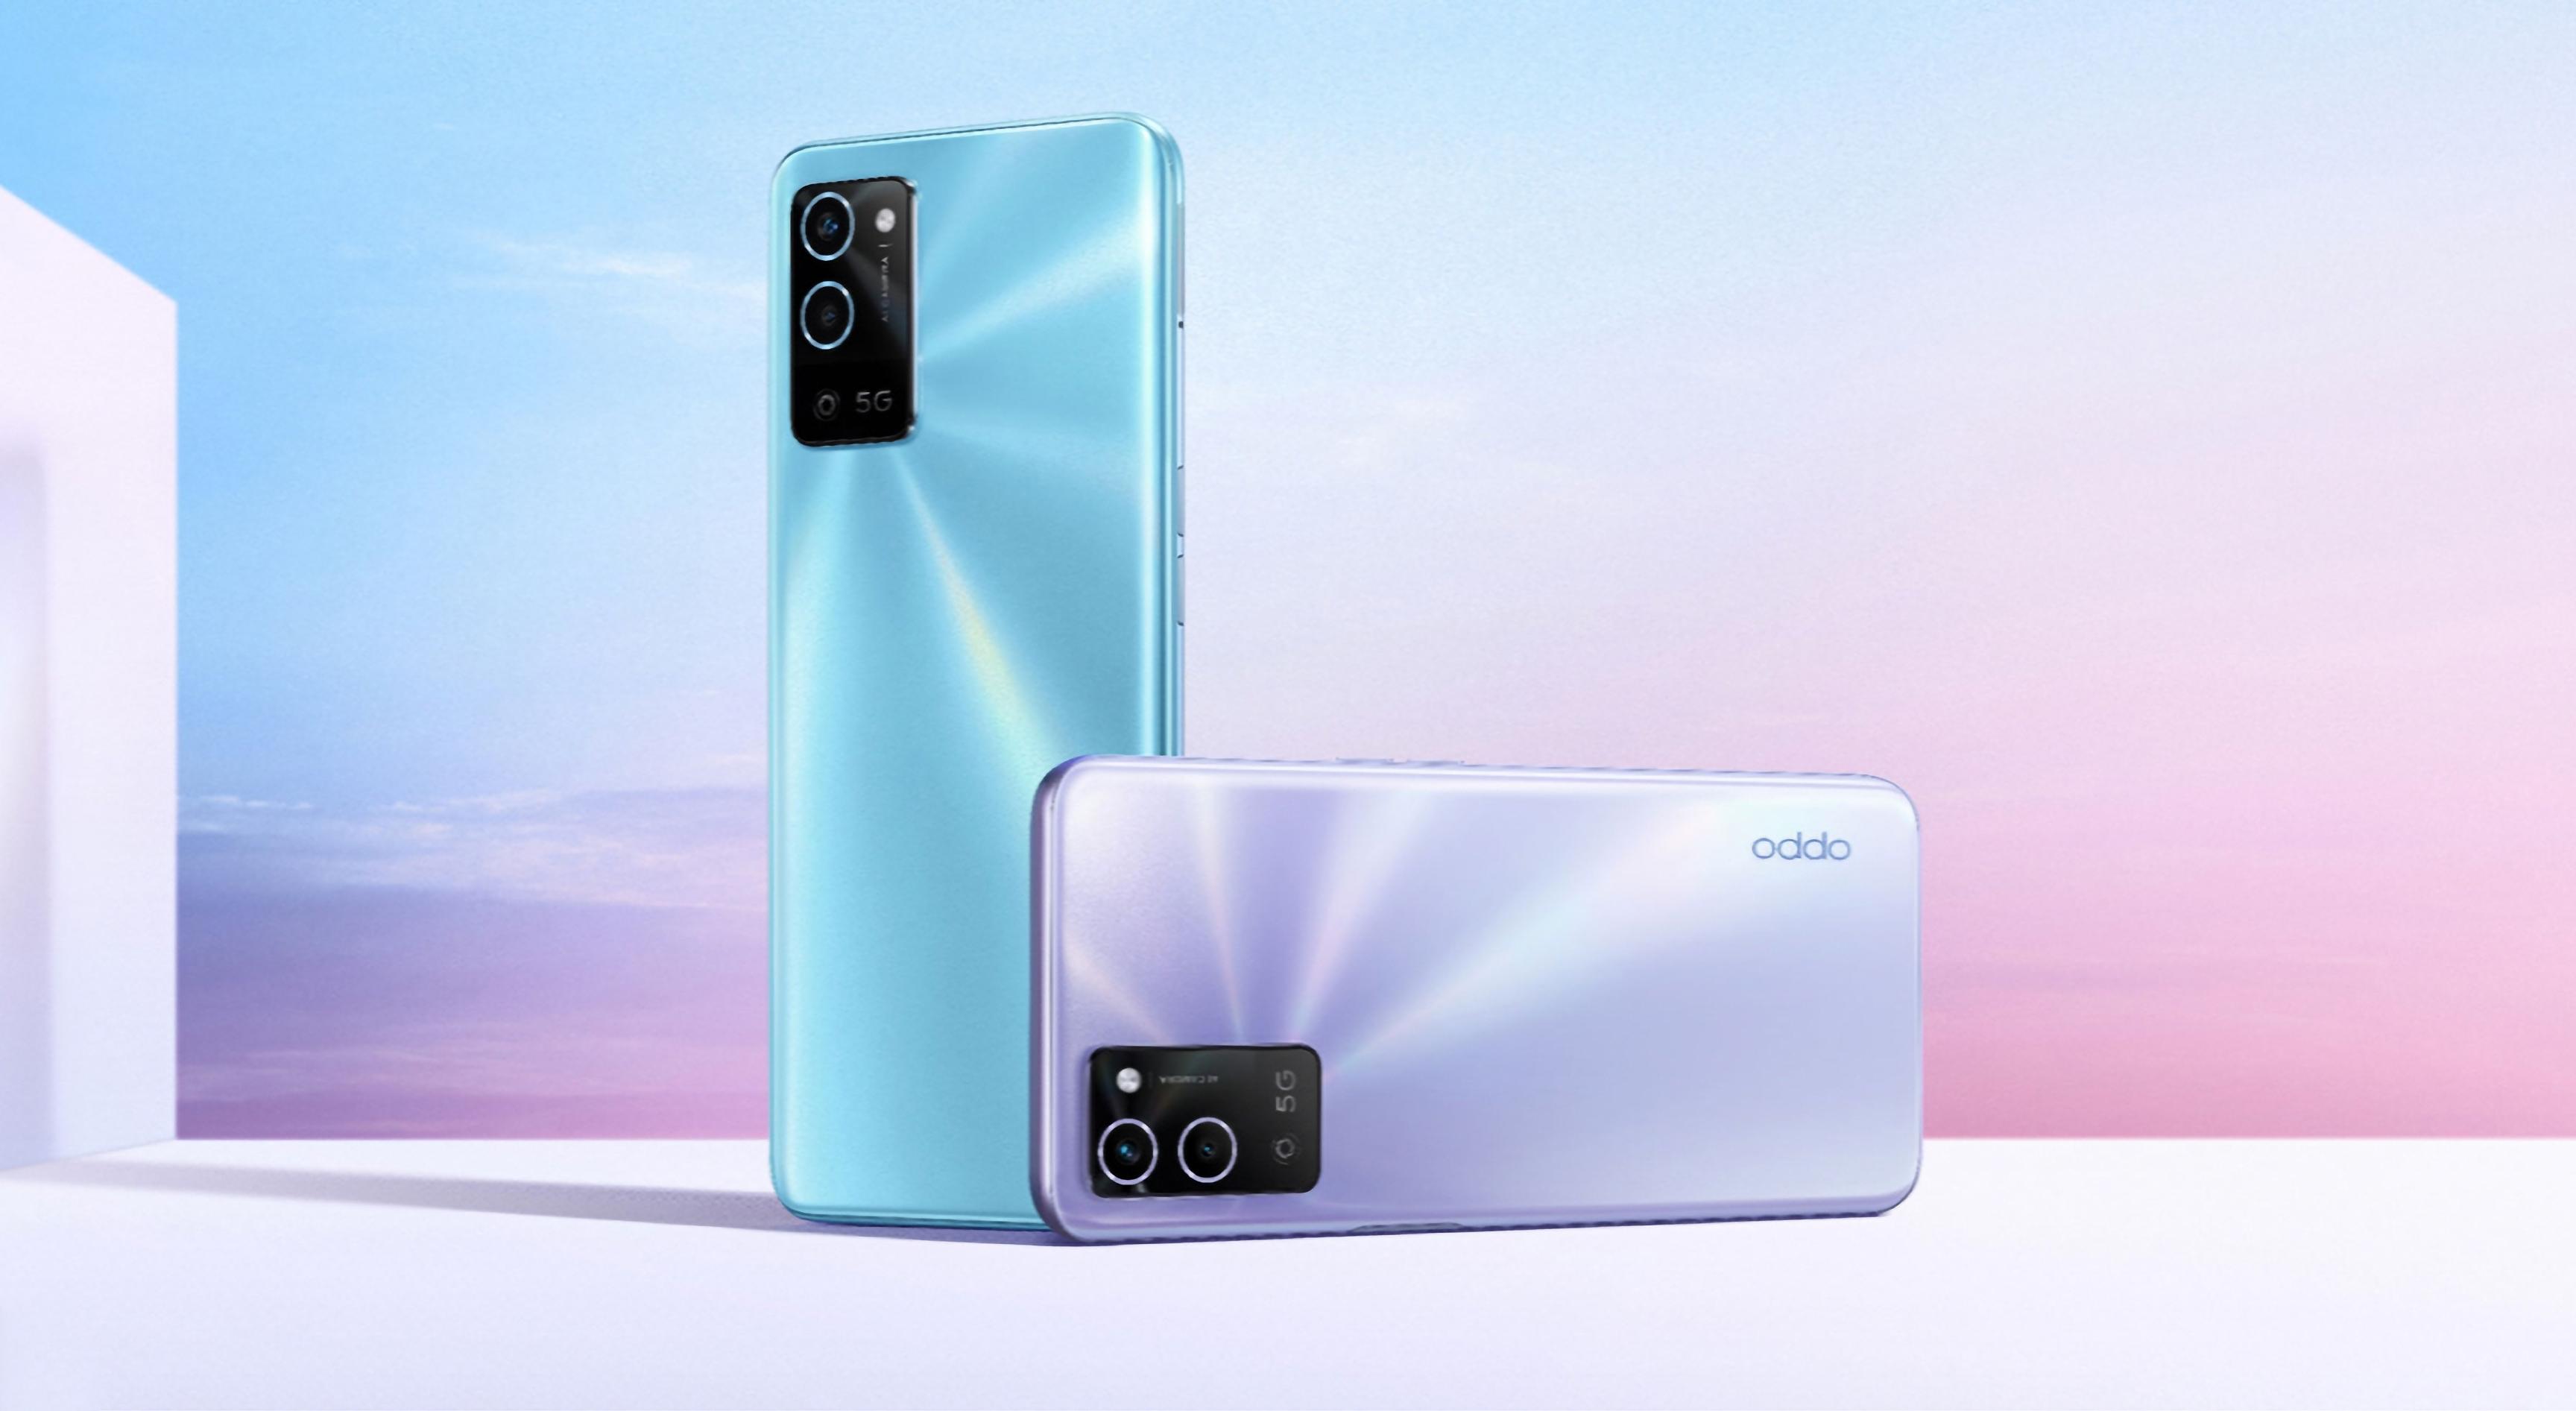 OPPO A56 5G: экран на 6.5 дюймов, двойная камера, чип MediaTek Dimensity 700 и до 11 ГБ ОЗУ за $250